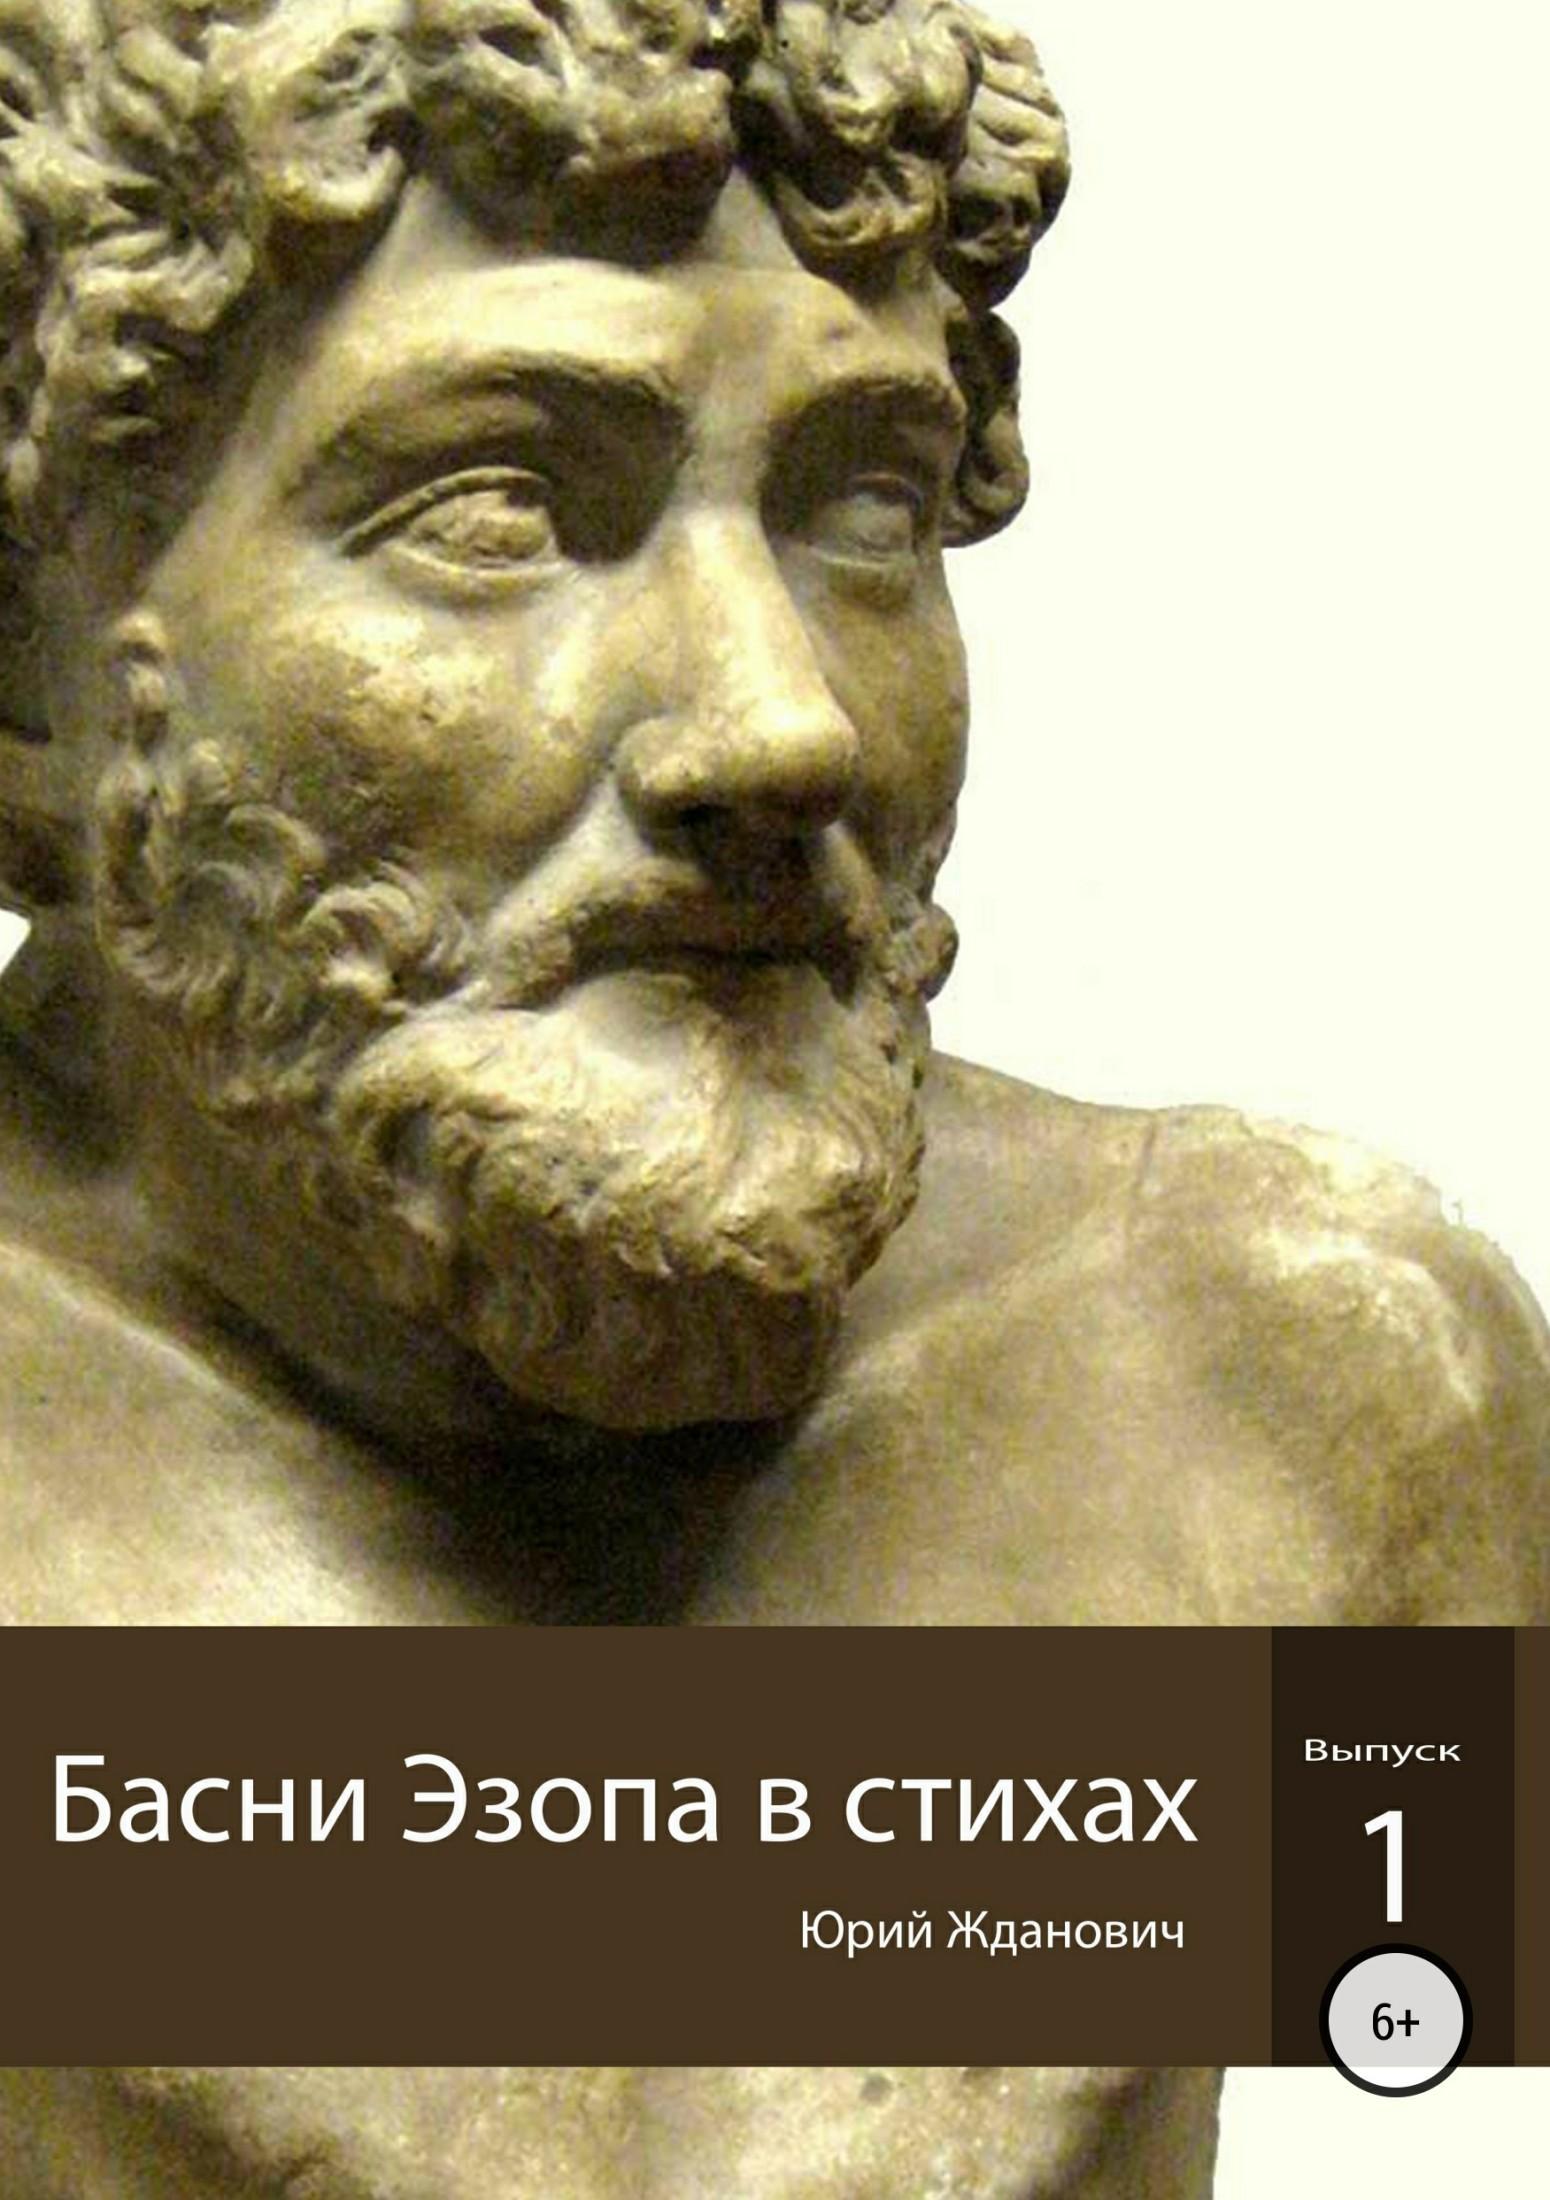 Юрий Михайлович Жданович Басни Эзопа в стихах. Выпуск 1 мастер класс басни с моралью